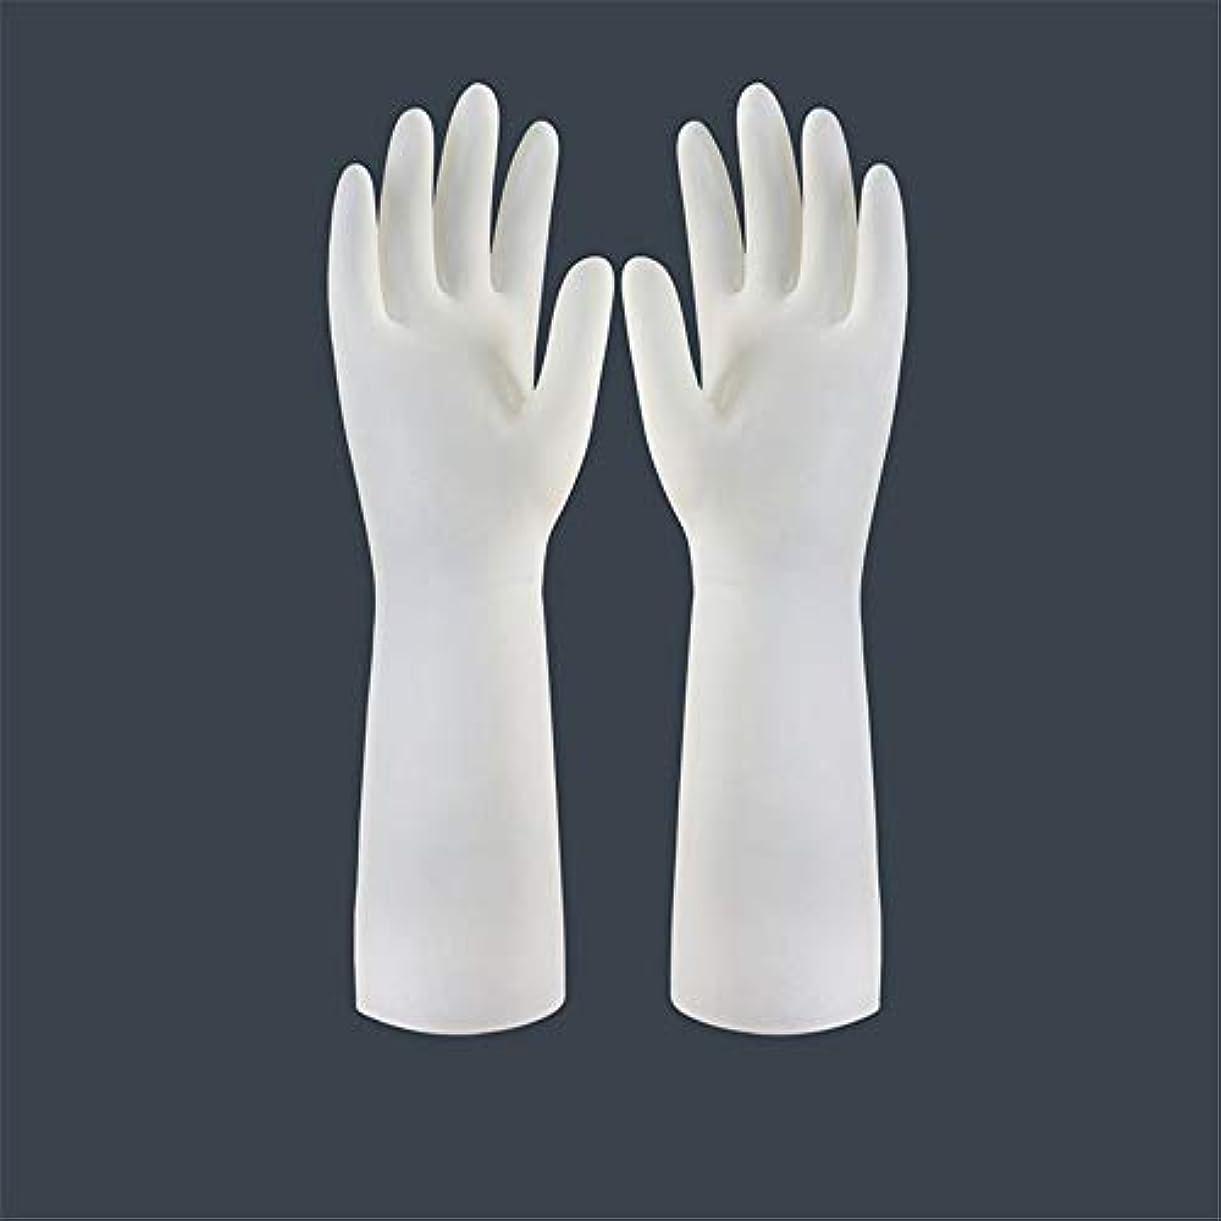 不健康前者性的BTXXYJP キッチン用手袋 手袋 食器洗い 作業 炊事 食器洗い 掃除 園芸 洗車 防水 防油 手袋 (Color : Long-1 pair, Size : L)